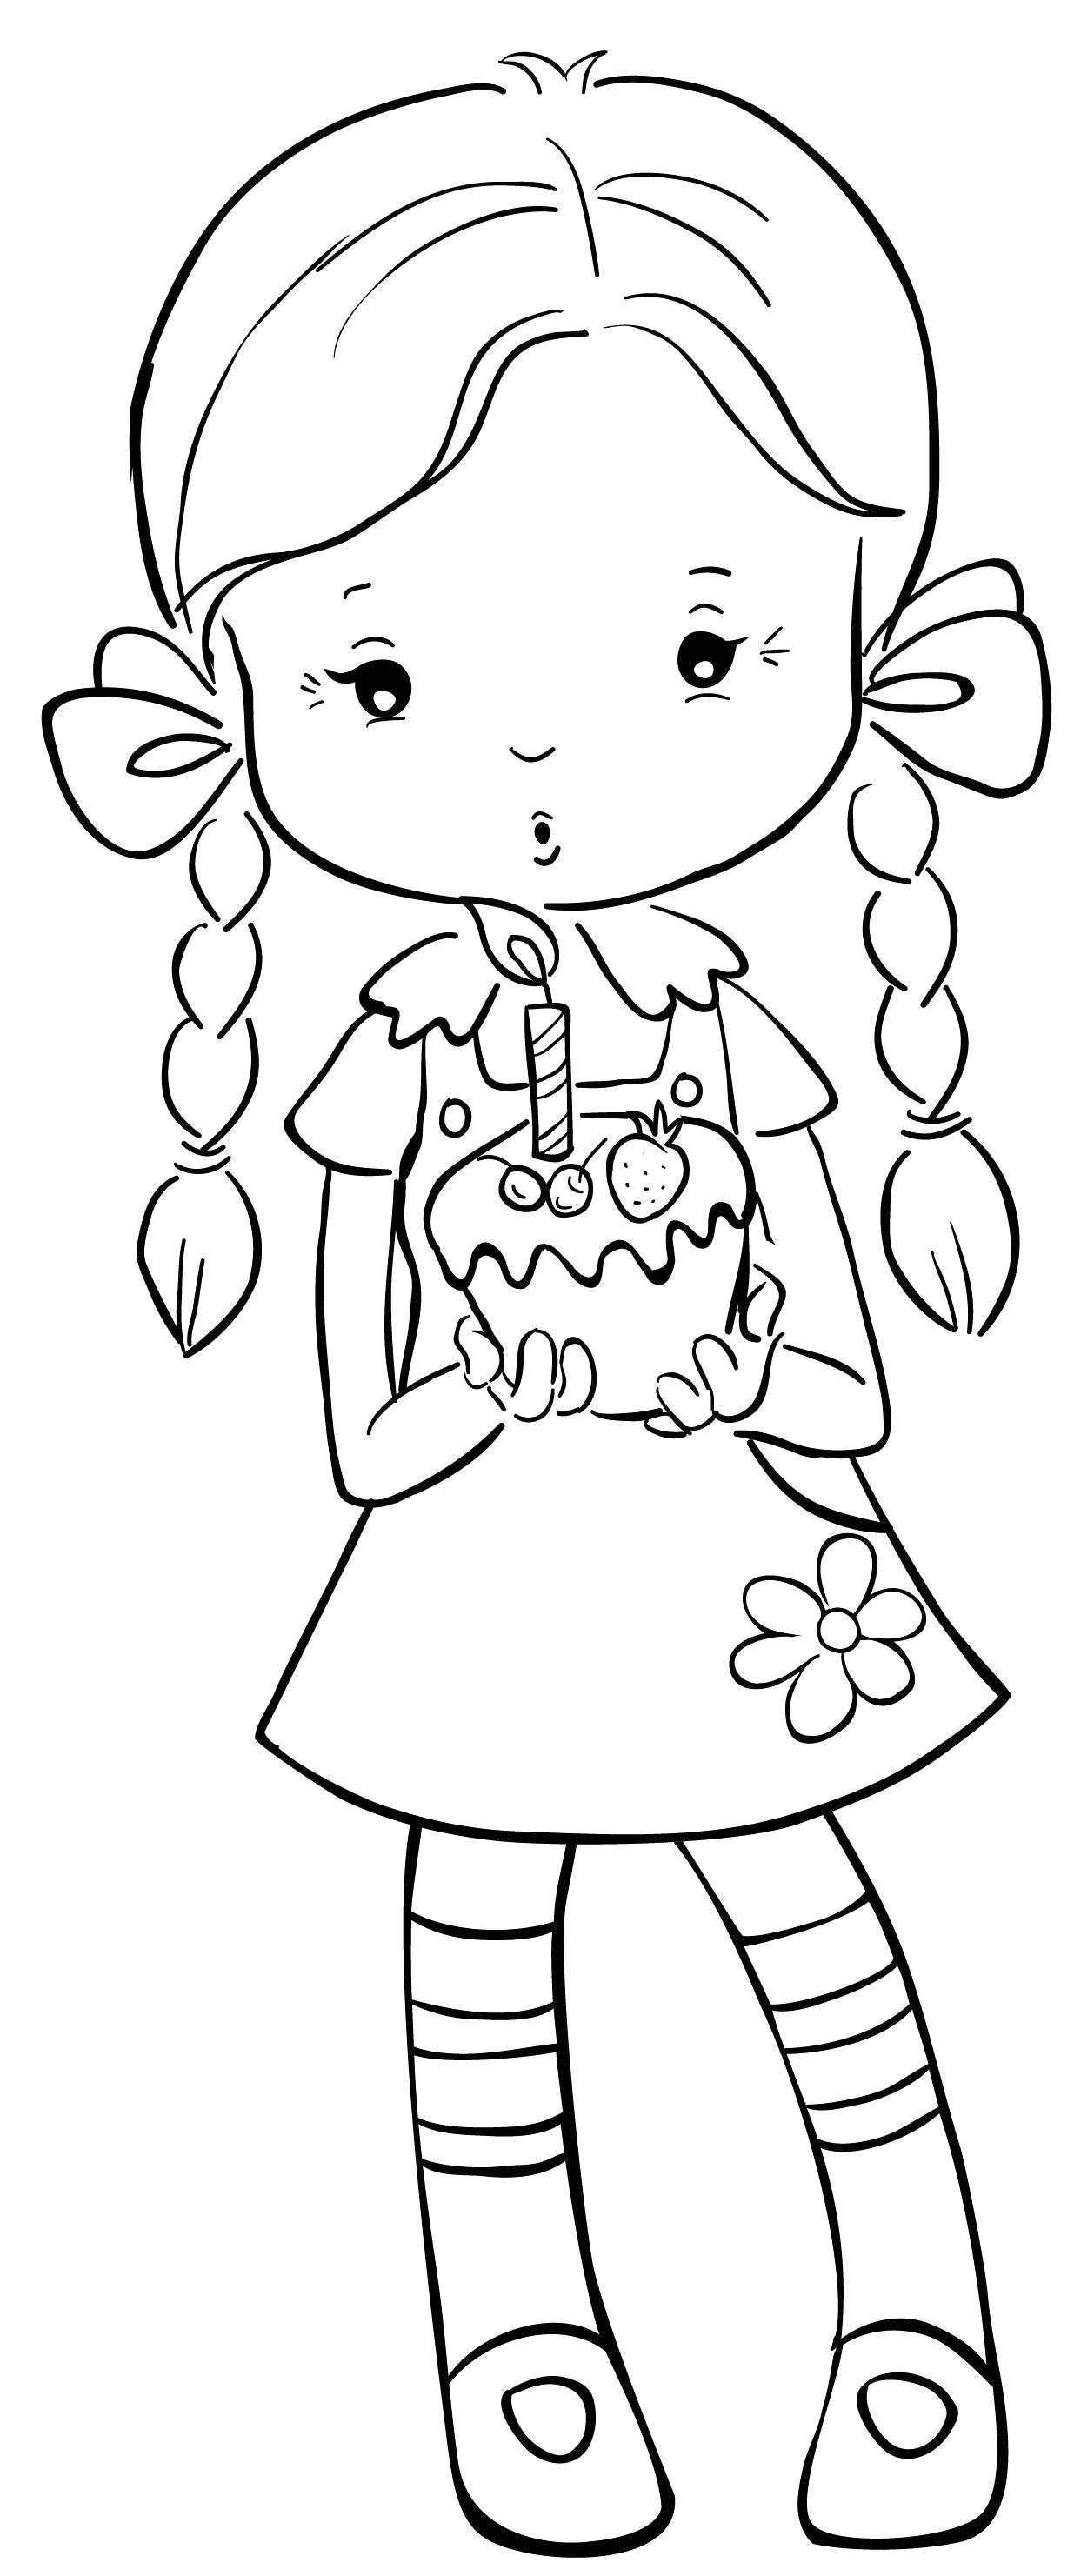 cupcake annie | patrones manualidades | Pinterest | Dibujo, Colorear ...